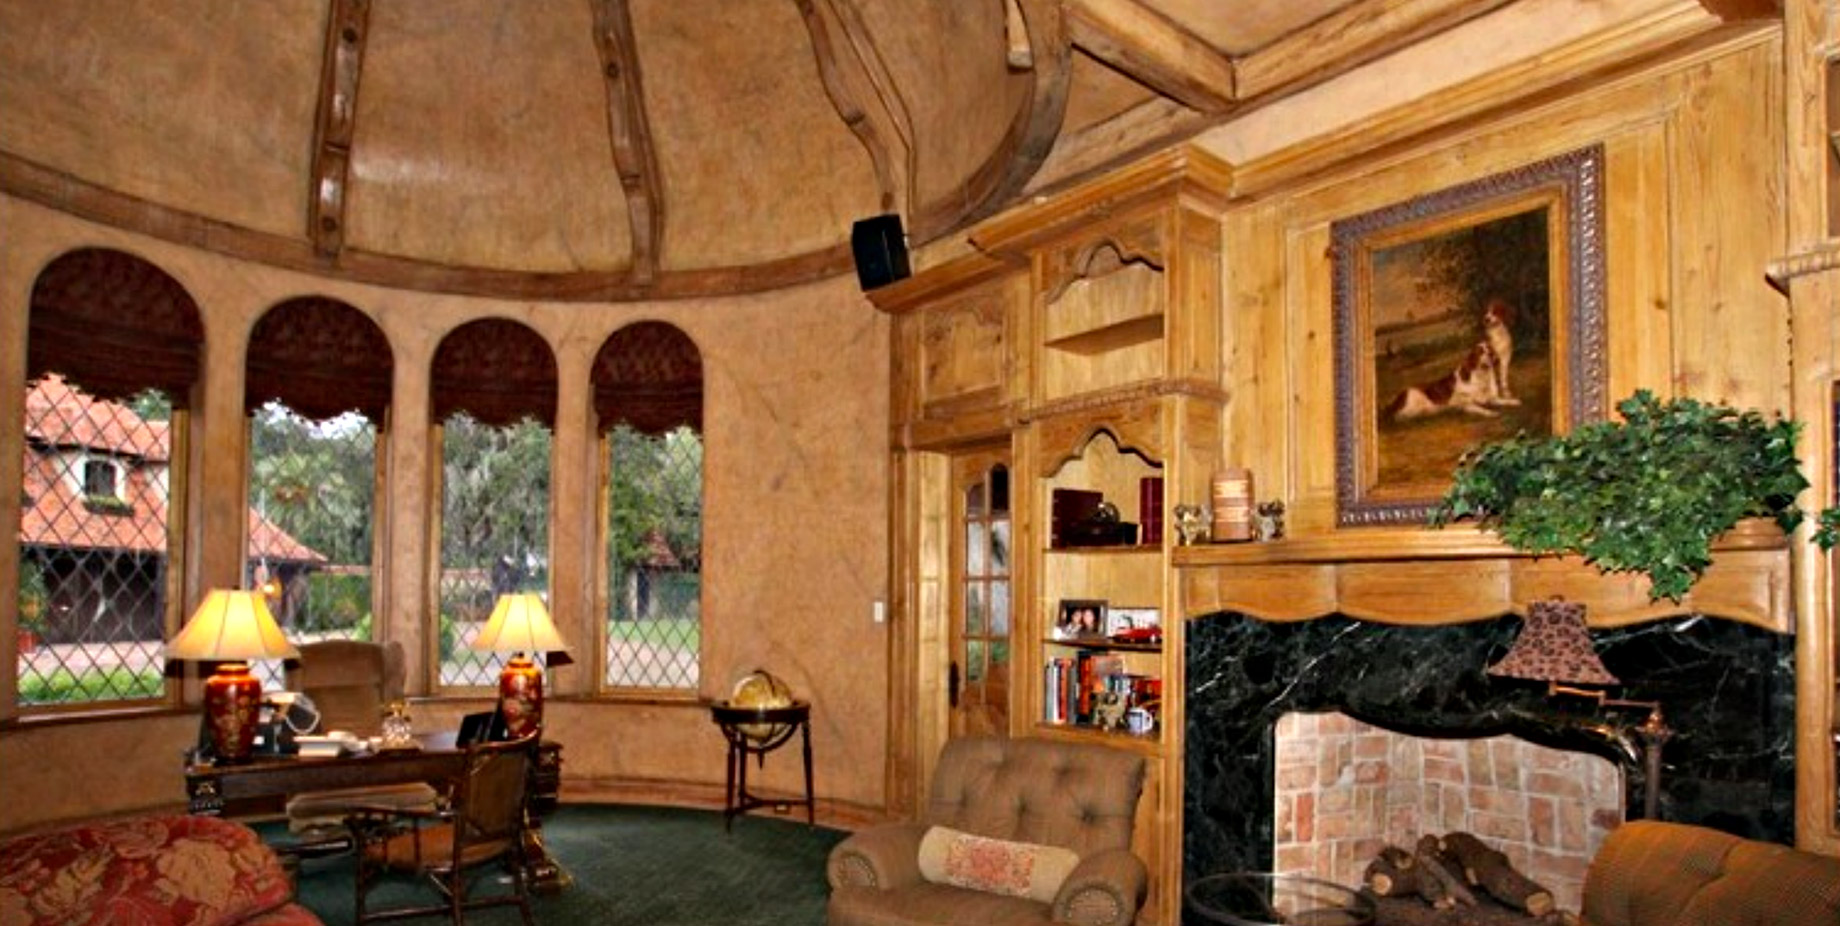 Hulk Hogan's Former Belleair Estate at 130 Willadel Drive in Florida